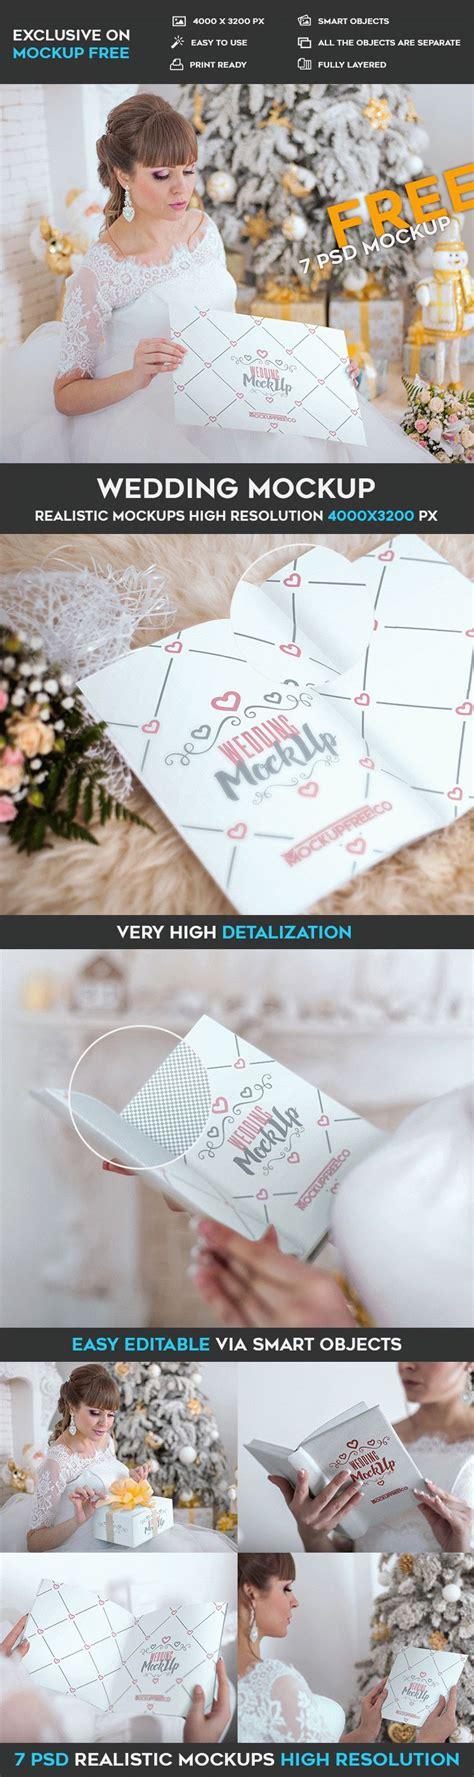 wedding book layout psd wedding invitation poster book 7 free psd mockups